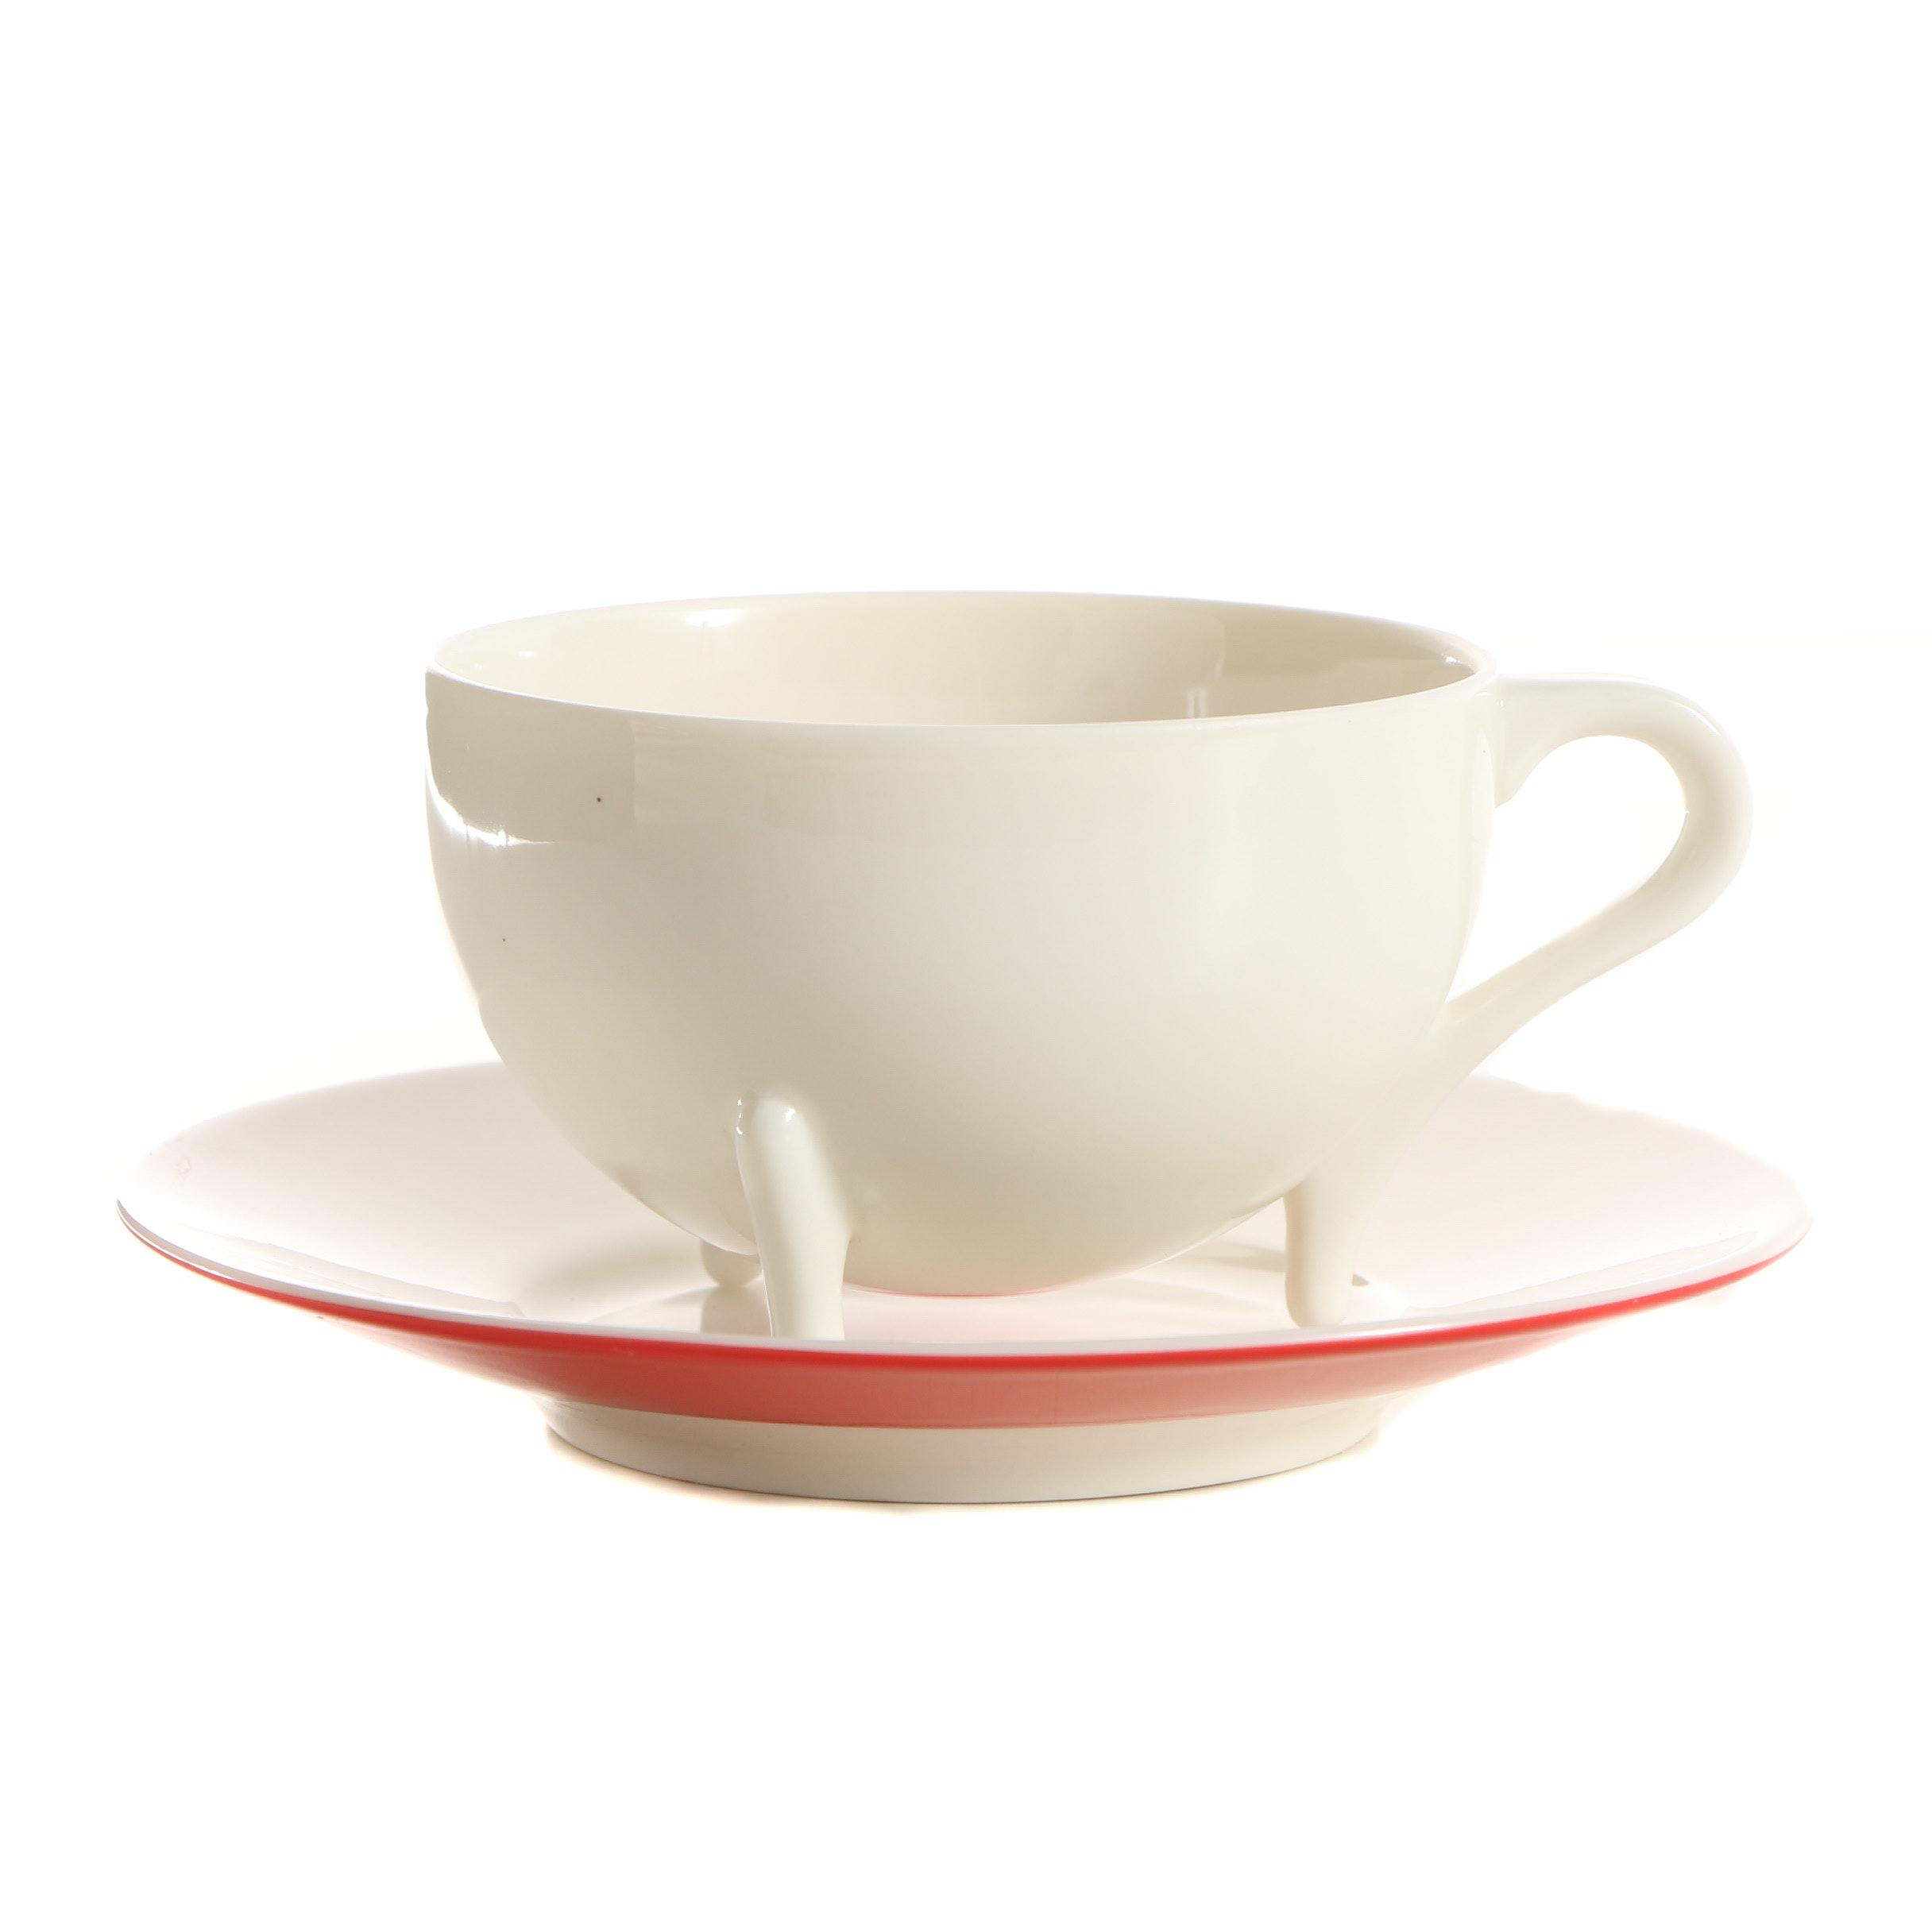 "Oscar Tusquets Blanca ""Victoria"" Porcelain Teacup and Saucer"